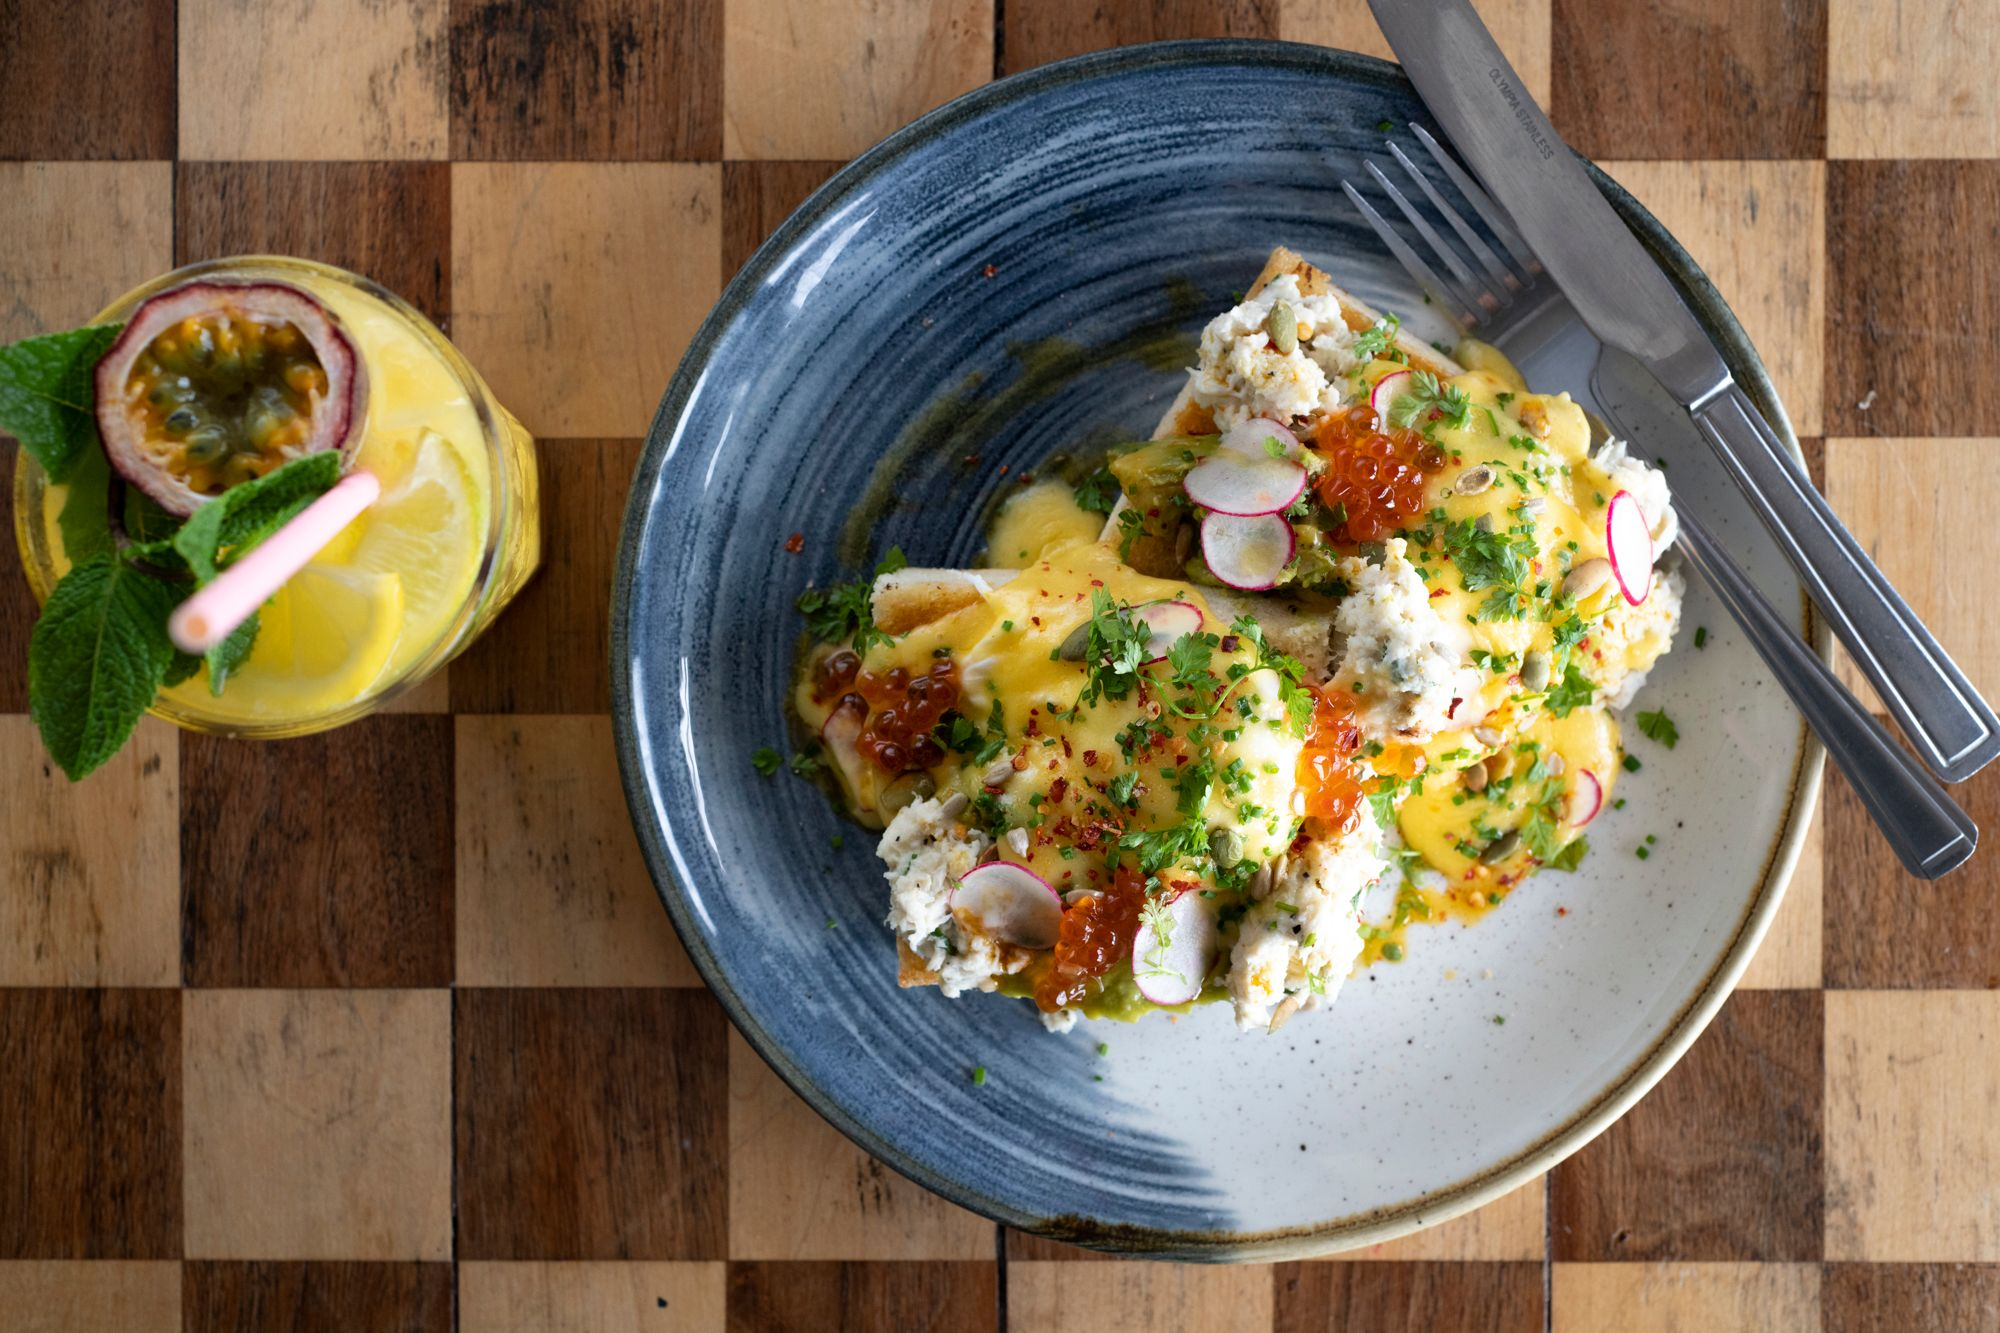 orange juice and eggs benedict